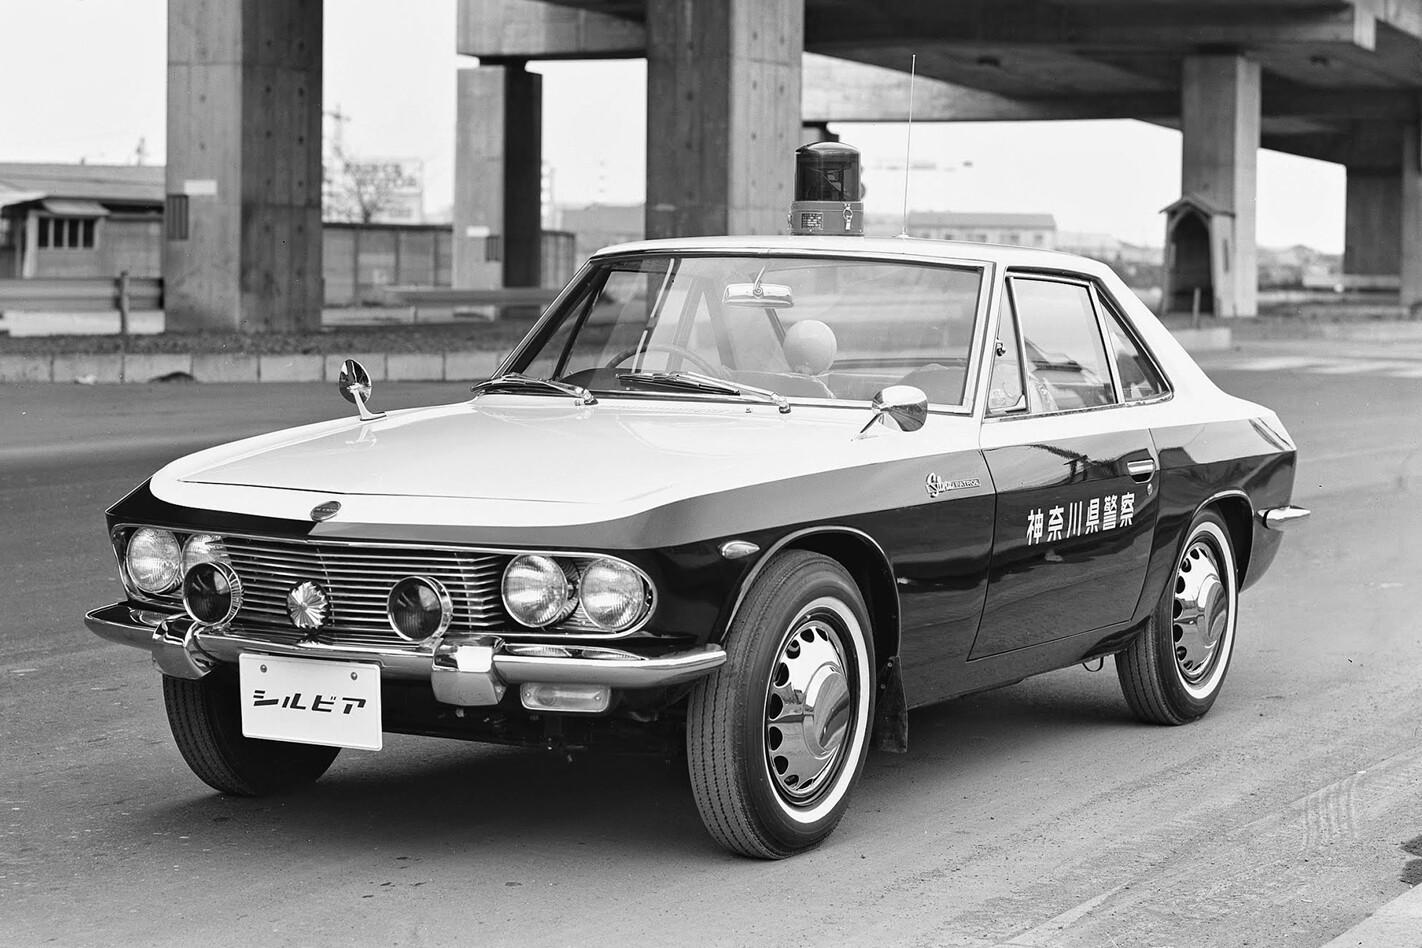 Nissan Silvia police